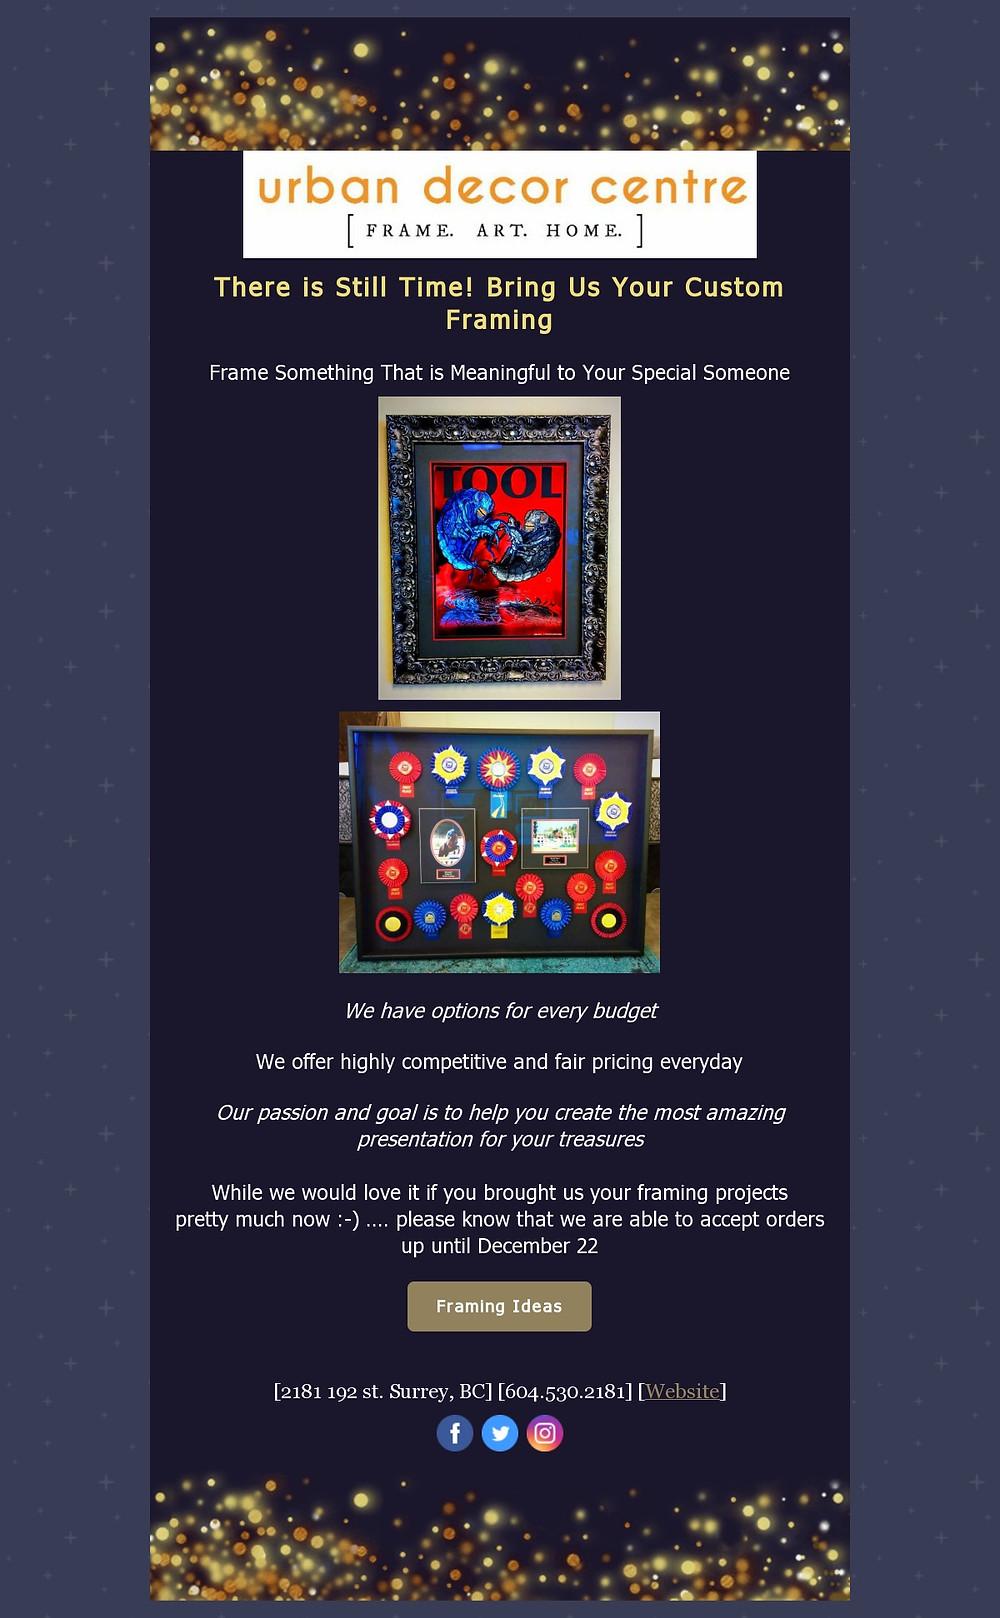 Bring us your custom framing. Up until Dec 22.